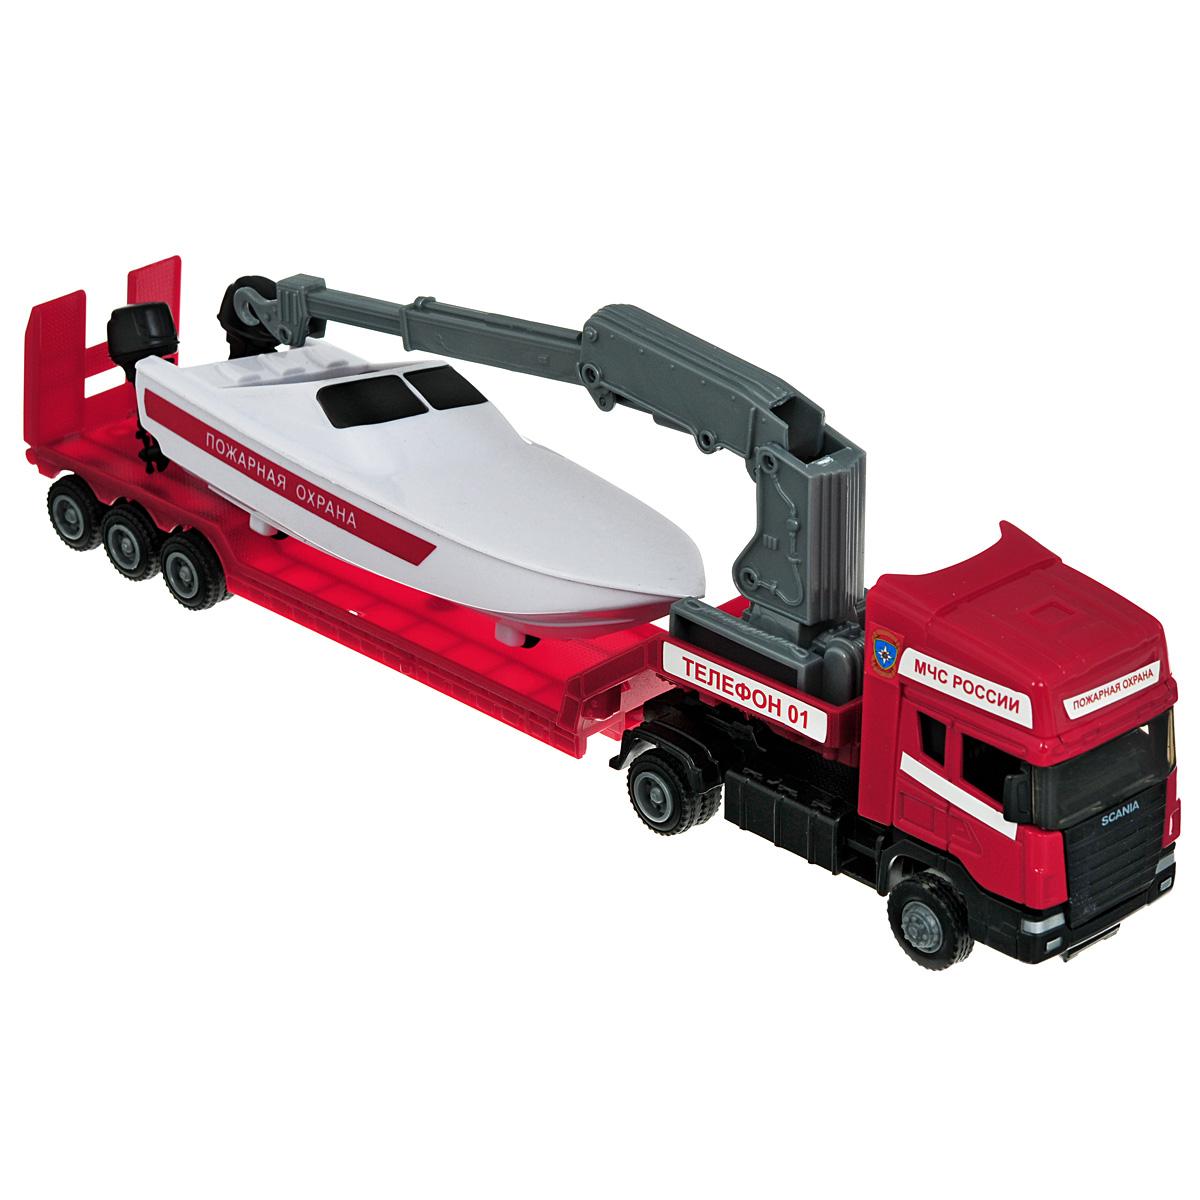 Autotime Игрушка Машинка Scania: Пожарная, c катером. Масштаб 1/48 модель машины chun base 1 43 scania